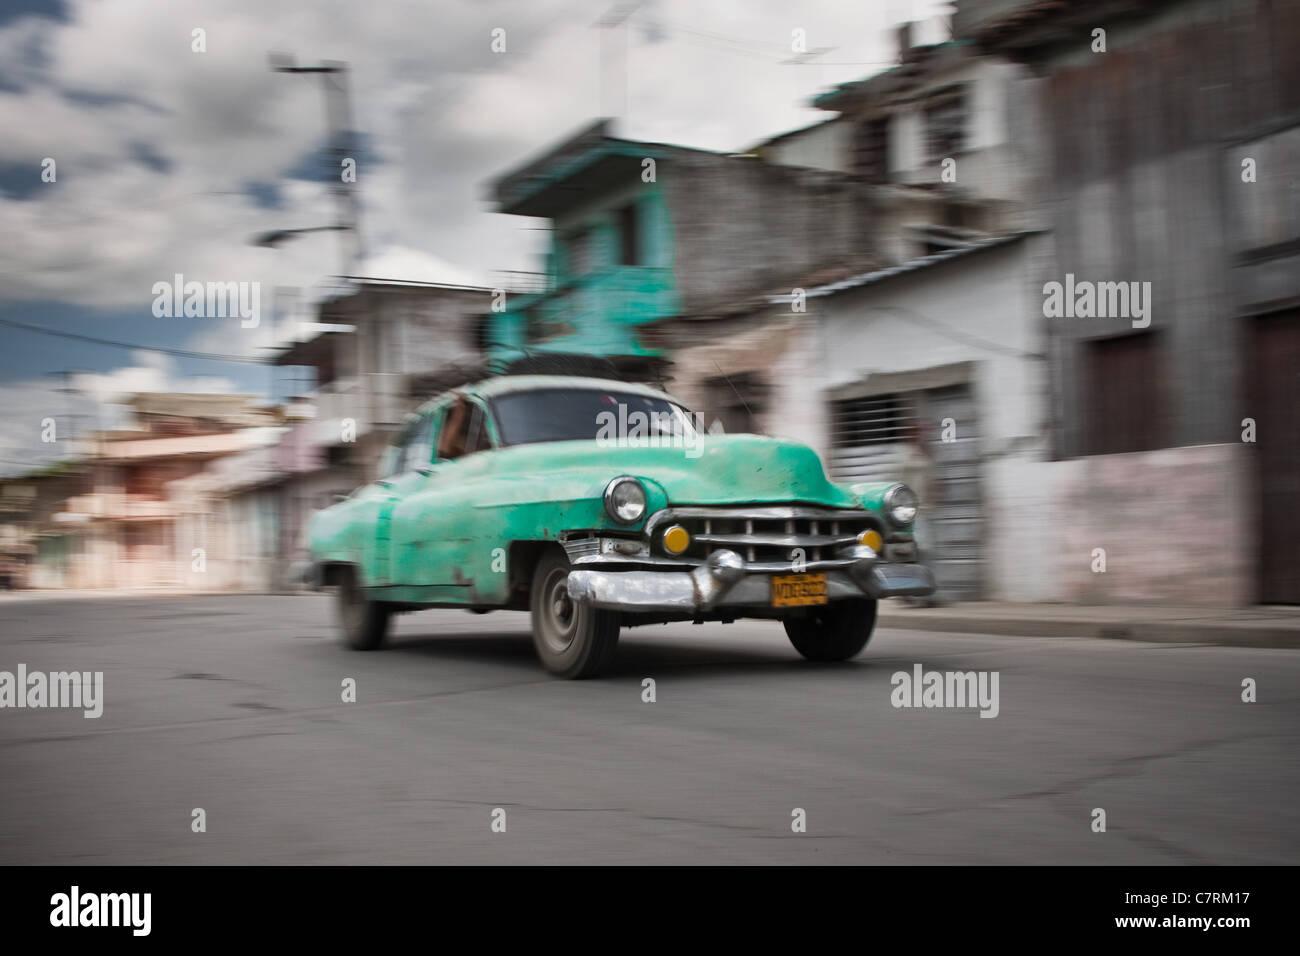 Vintage car in Santa Clara - Stock Image